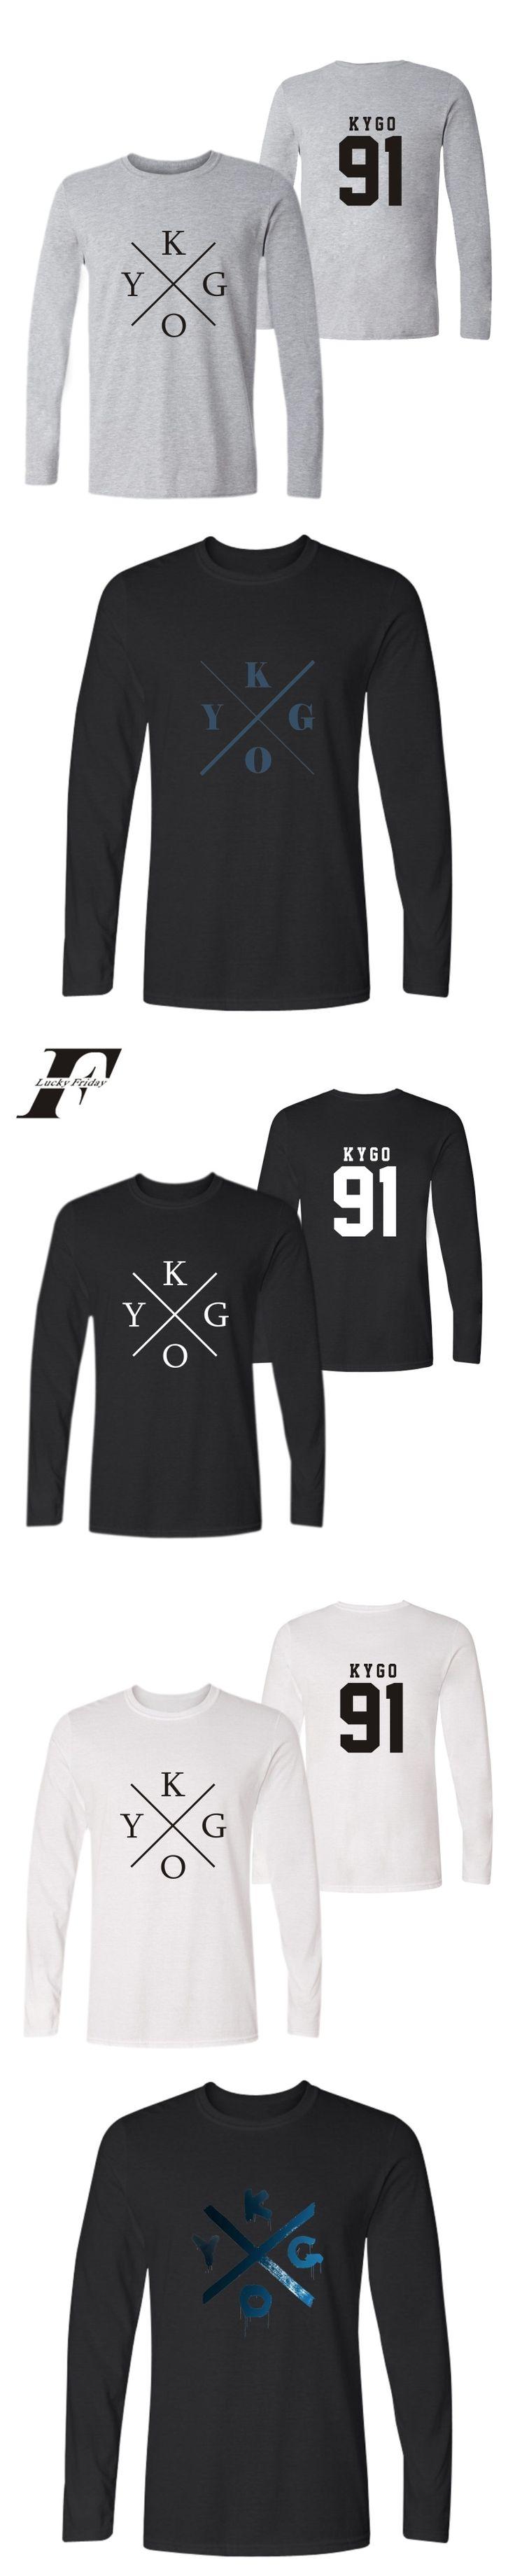 LUCKYFRIDAYF harajuku hip hop DJ Kygo Logo Fans Autumn T-shirt Print Men fitness Tshirt Homme Cotton Long sleeve Tshirt 4XL